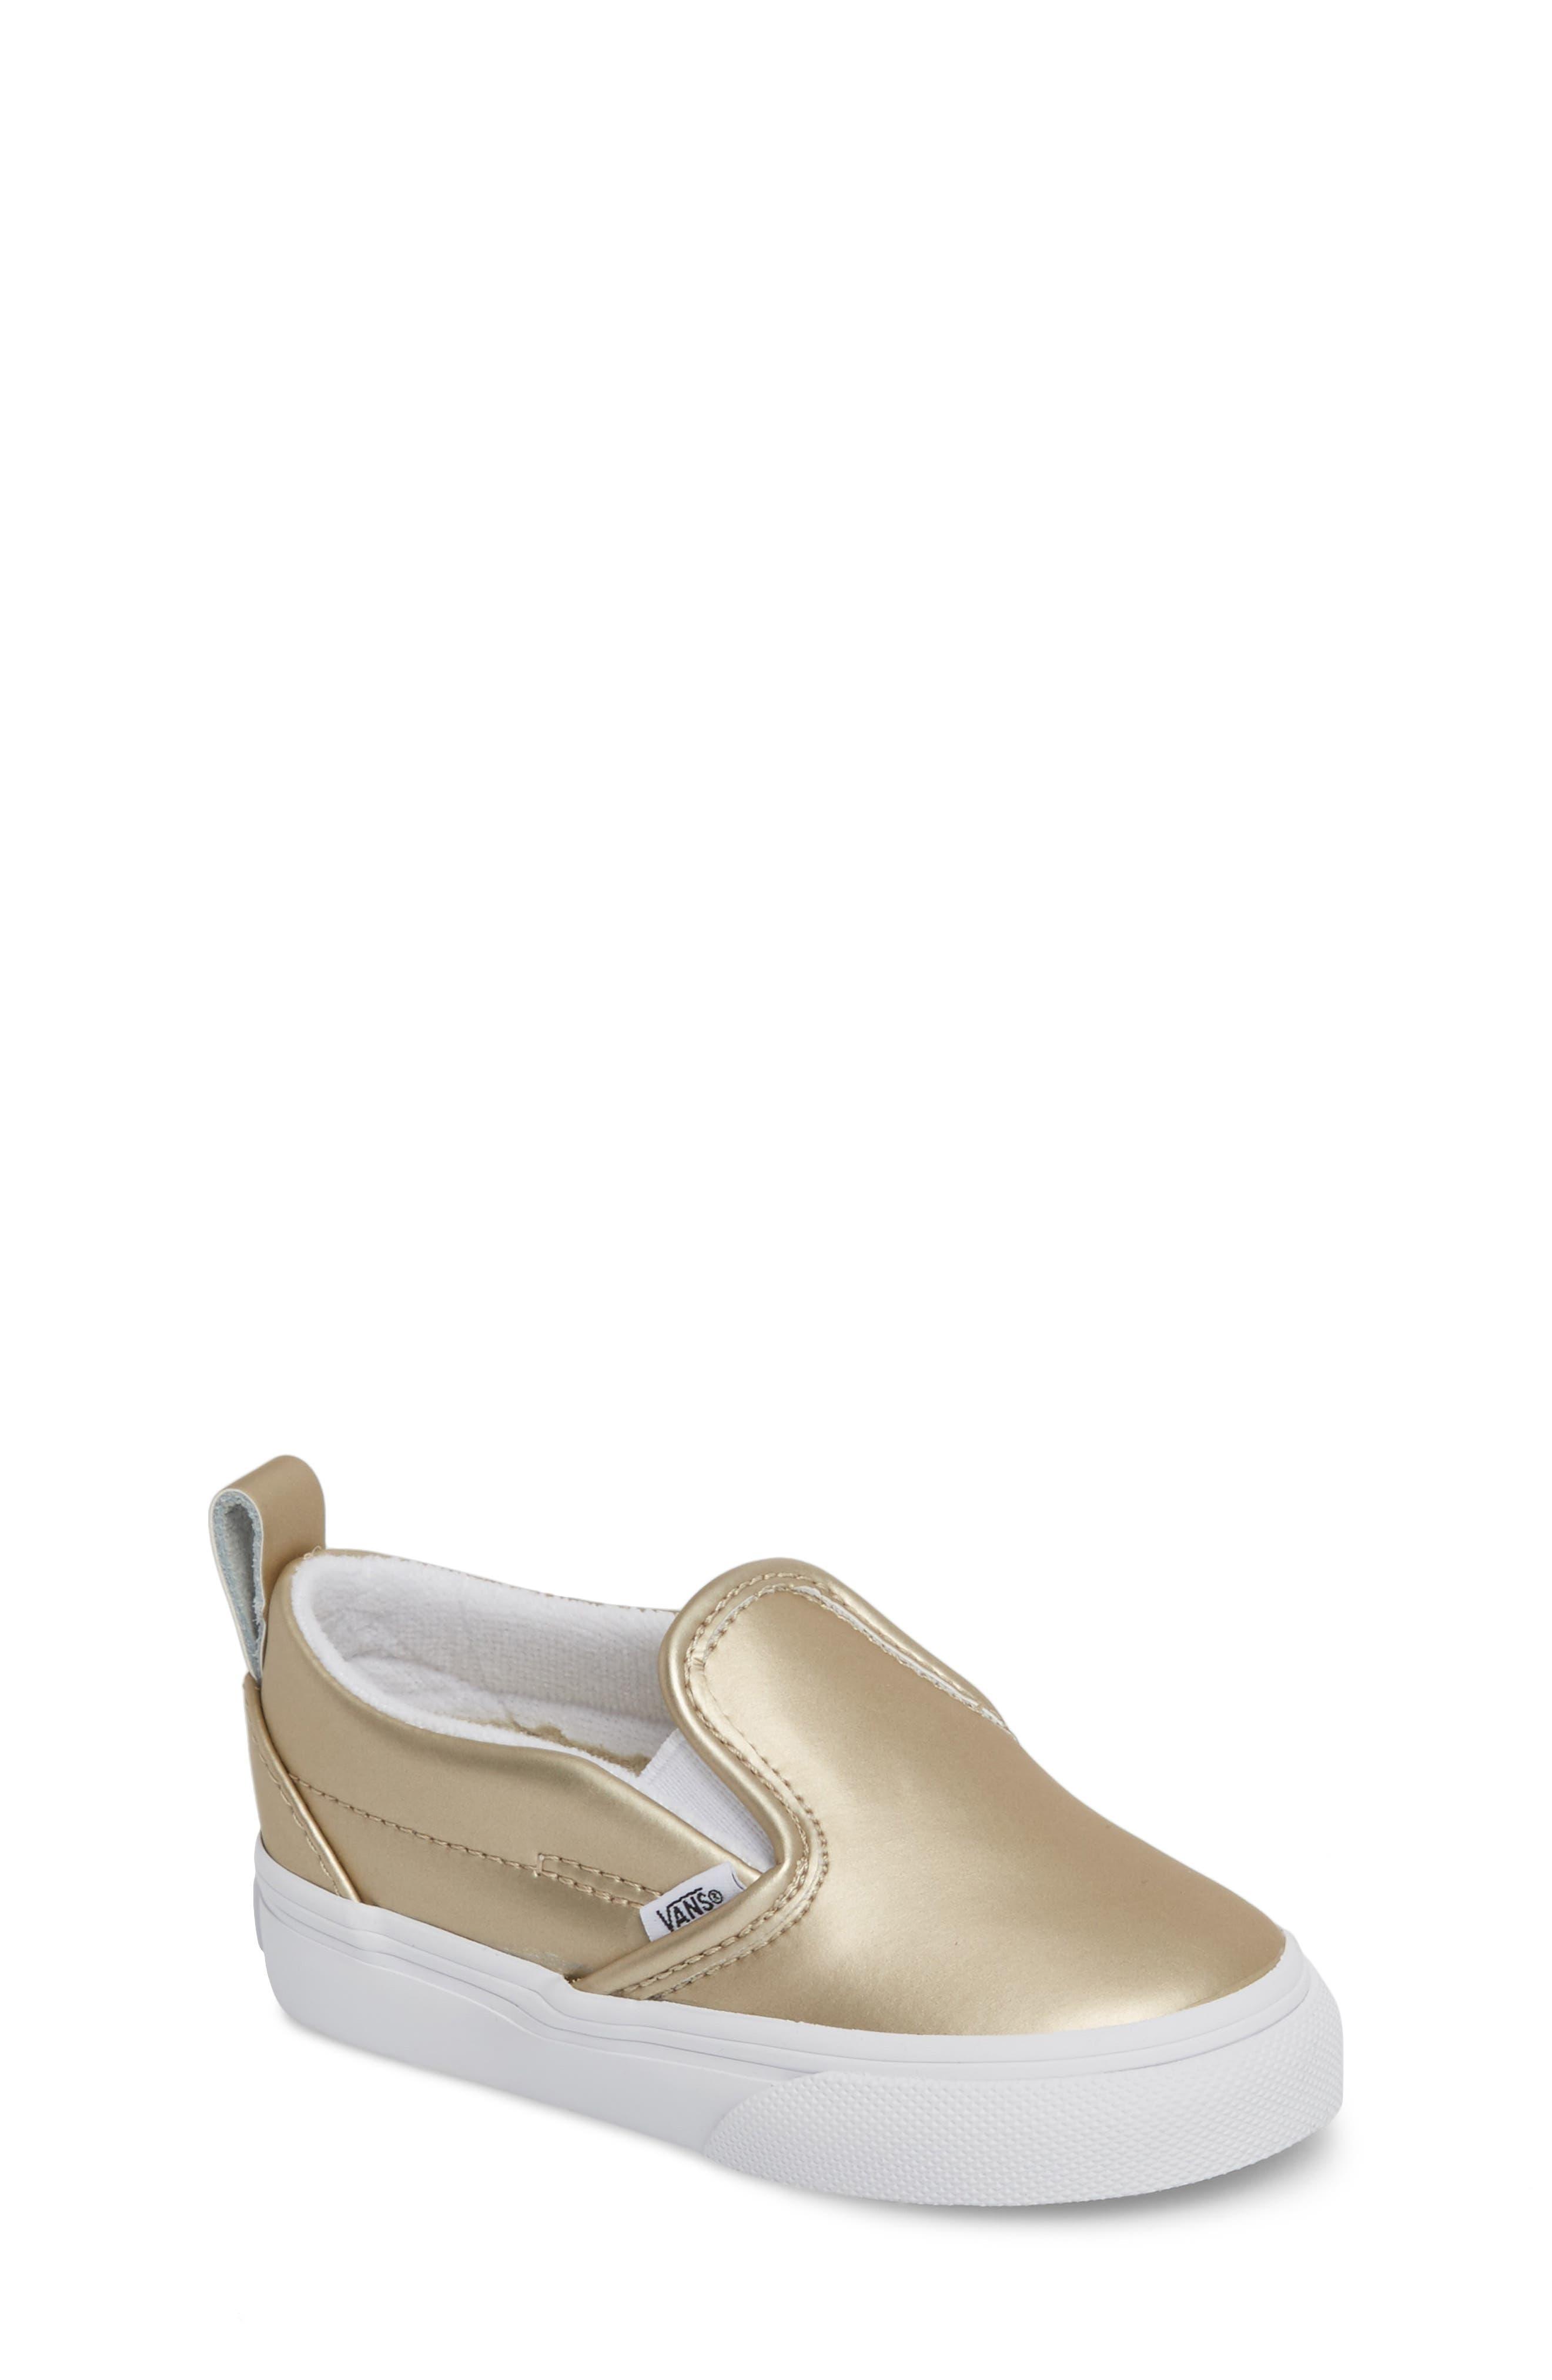 Classic Slip-On V Sneaker,                         Main,                         color, Muted Metallic Gold/ White